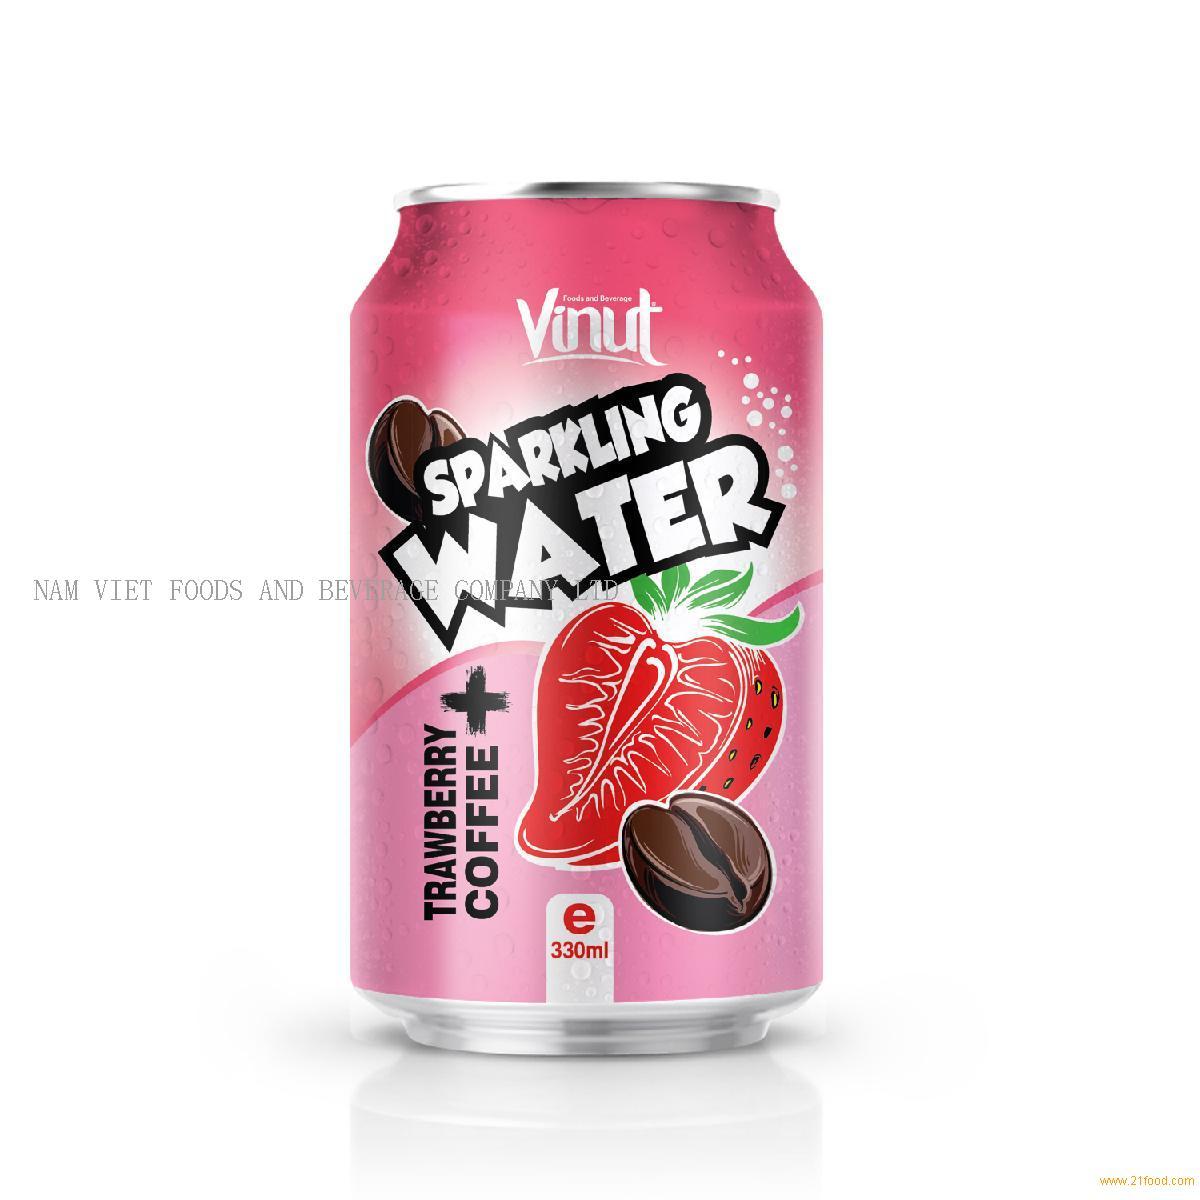 330ml VINUT Strawberry Coffee Sparkling water